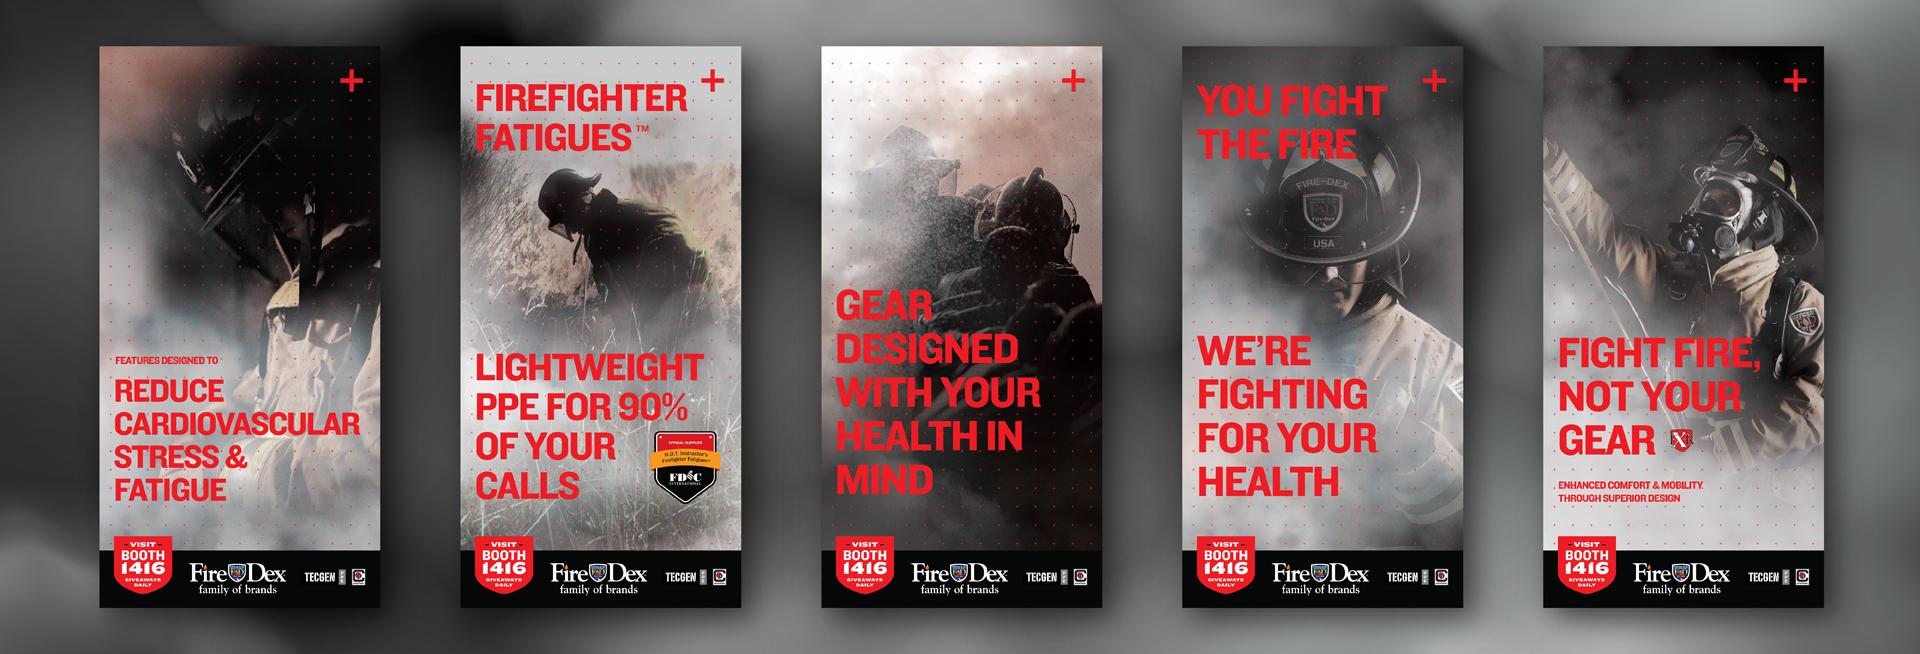 FireDex Graphic Design Posters FDIC 2016